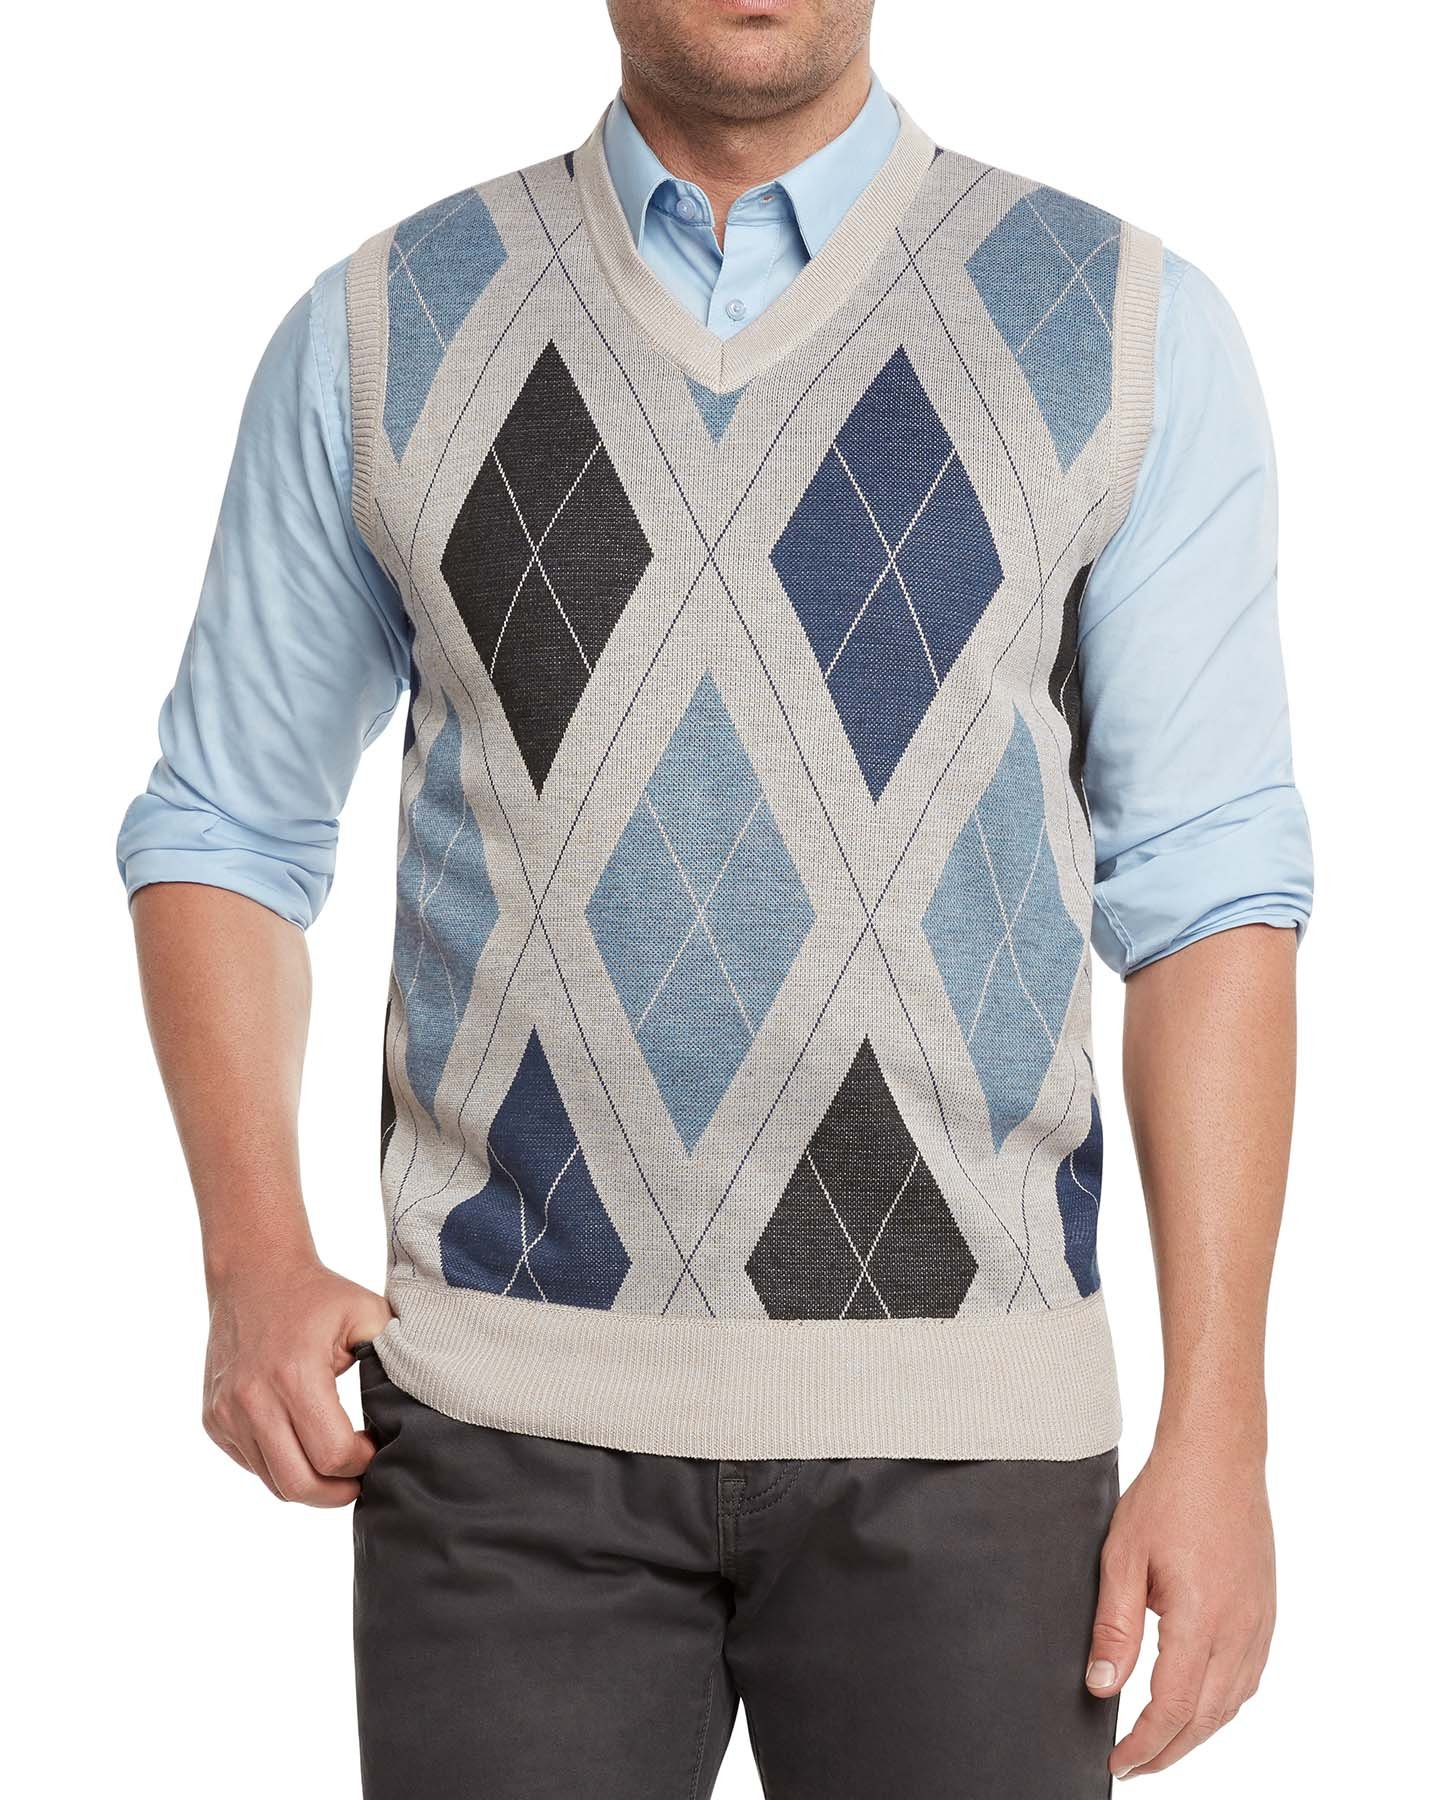 True Rock Men's Argyle V-Neck Sweater Vest-Beige/Blue/Blk-Medium